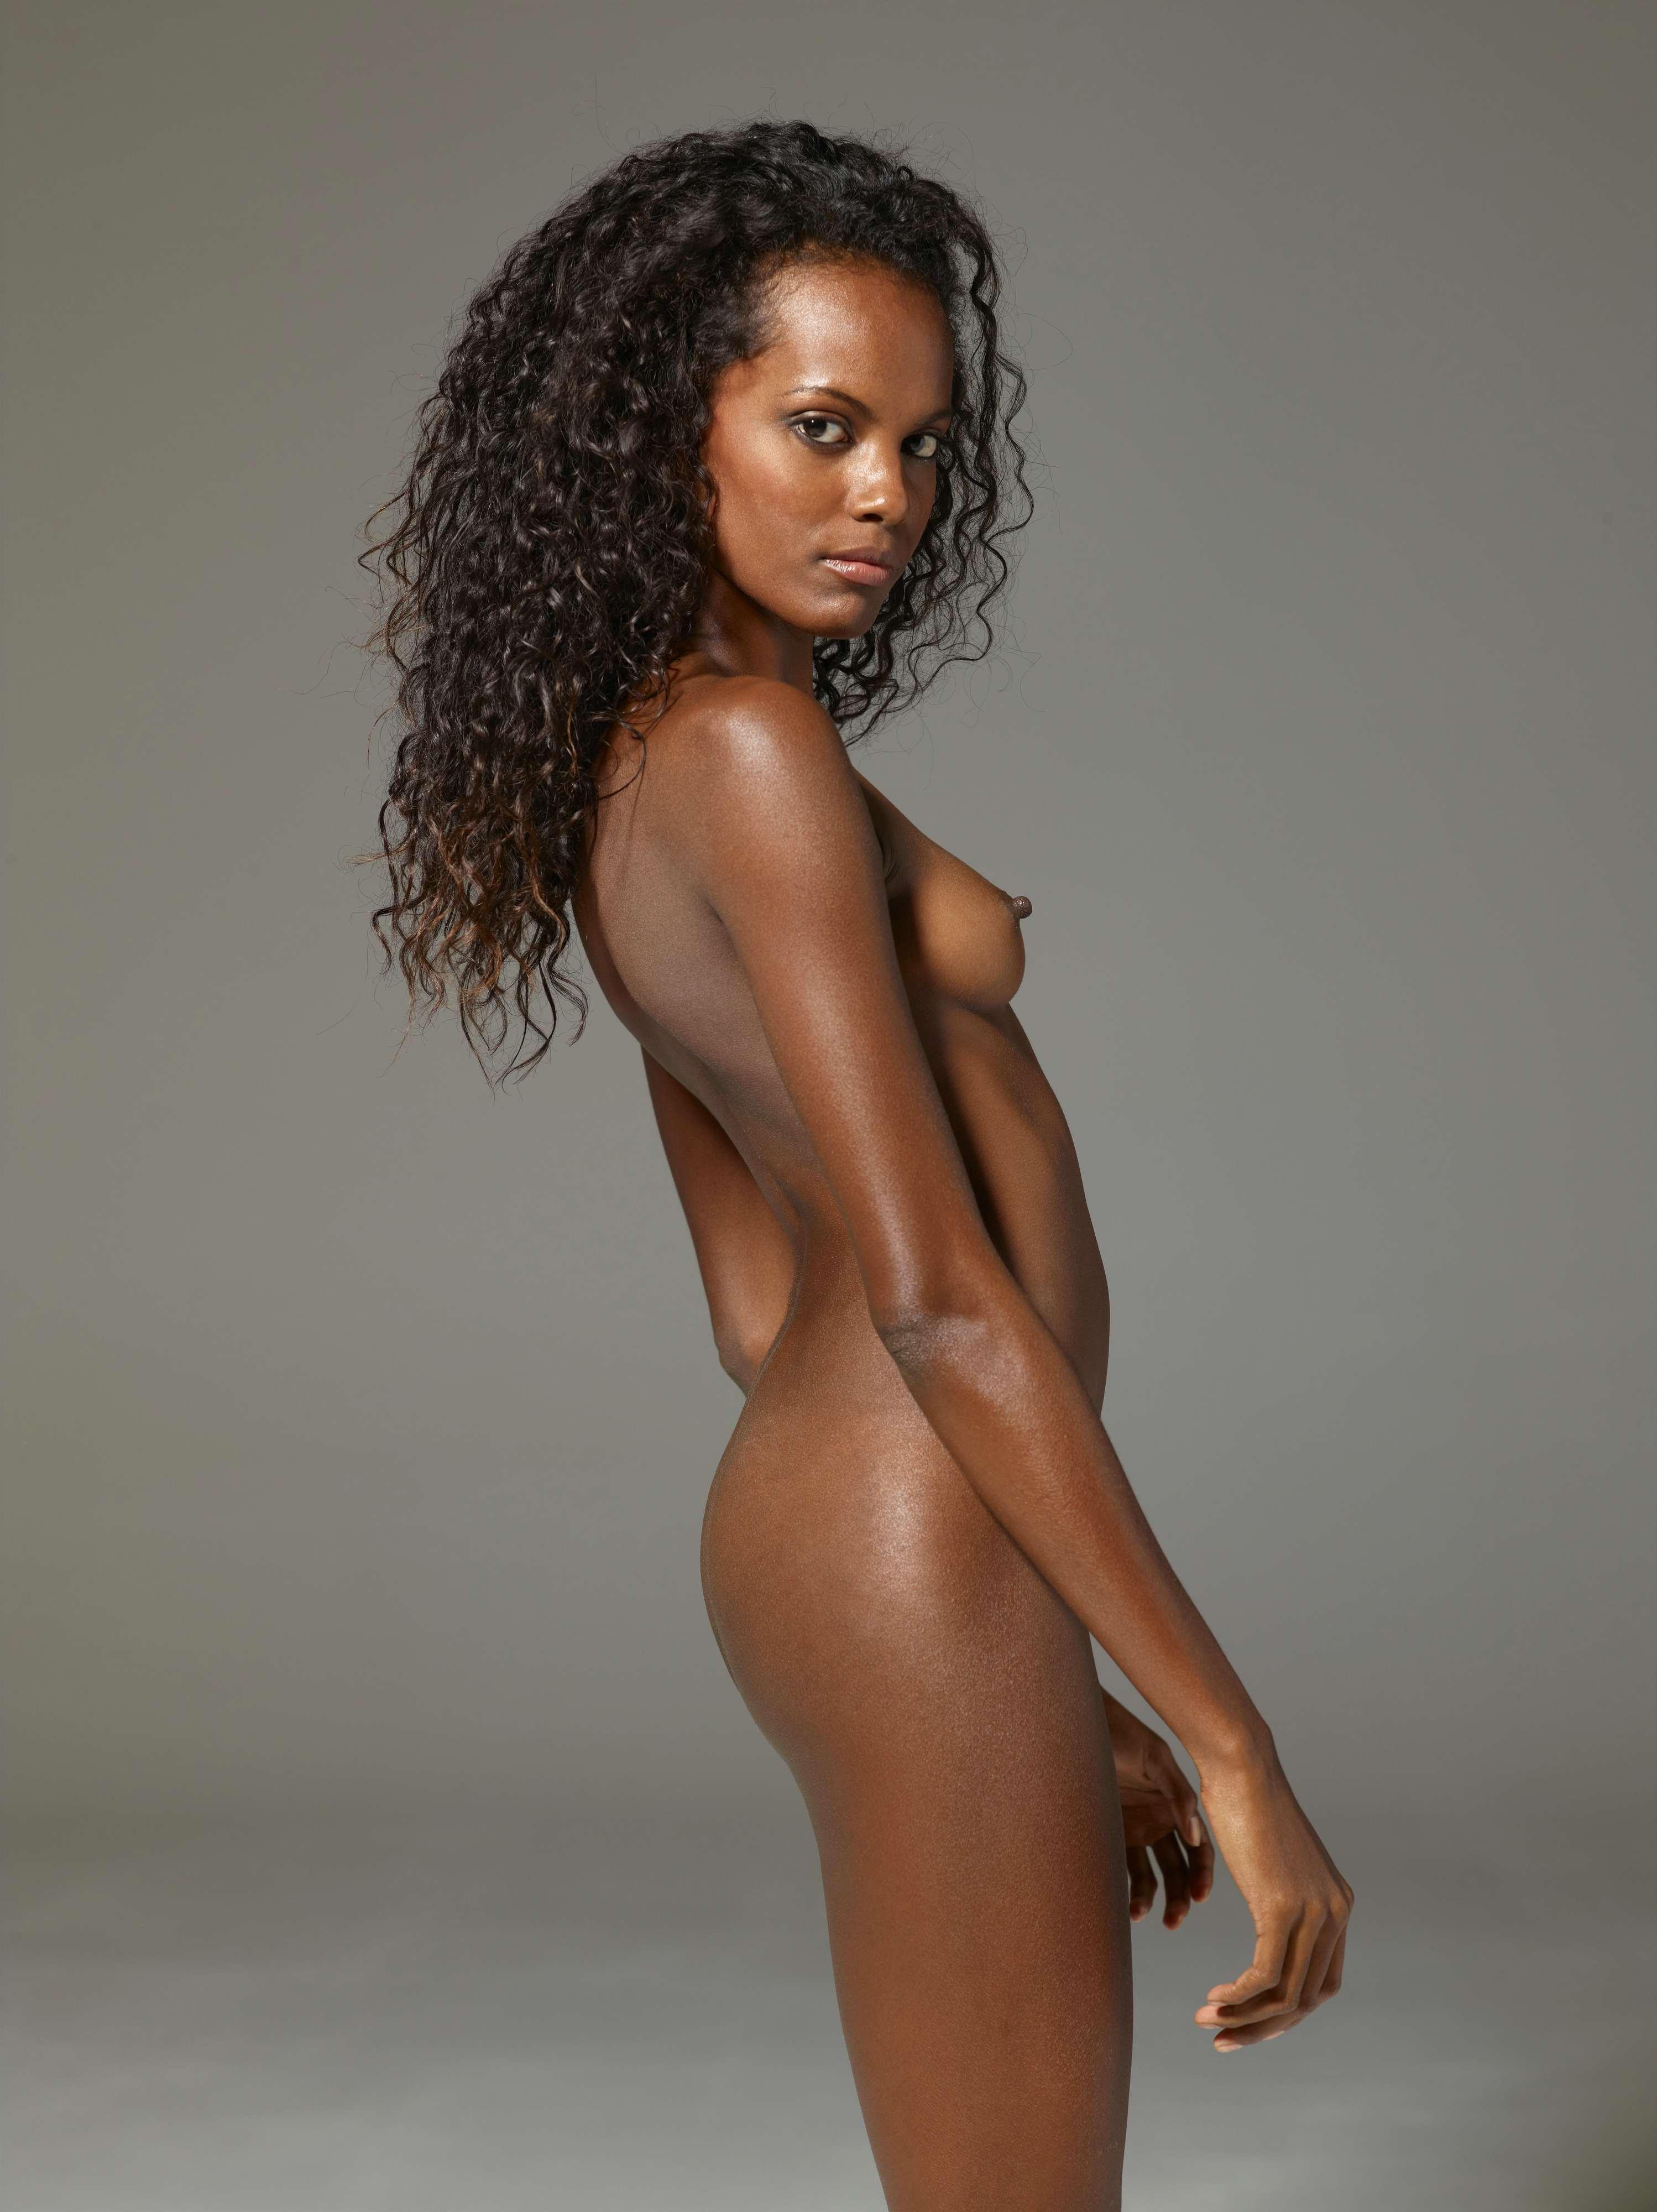 Nacked Black Woman